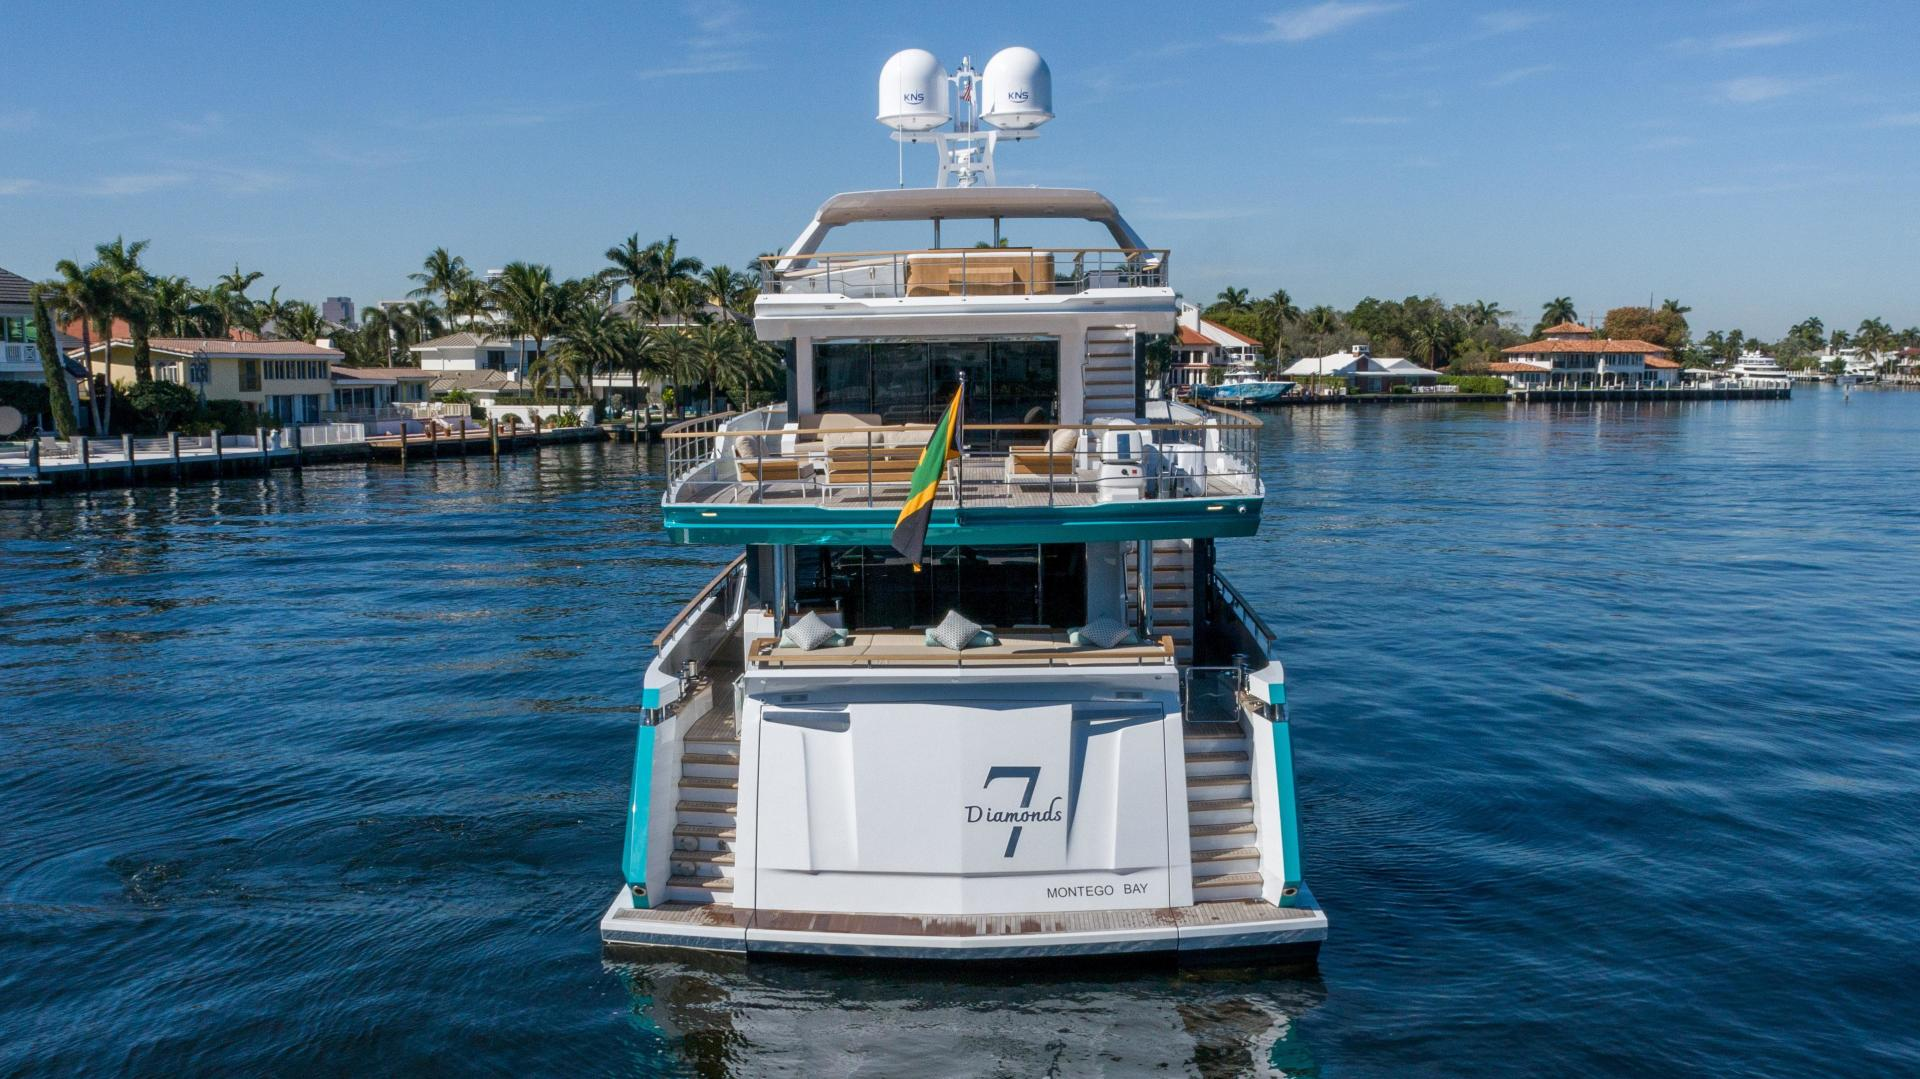 Numarine-32XP 2020-7 Diamonds Fort Lauderdale-Florida-United States-1629344 | Thumbnail